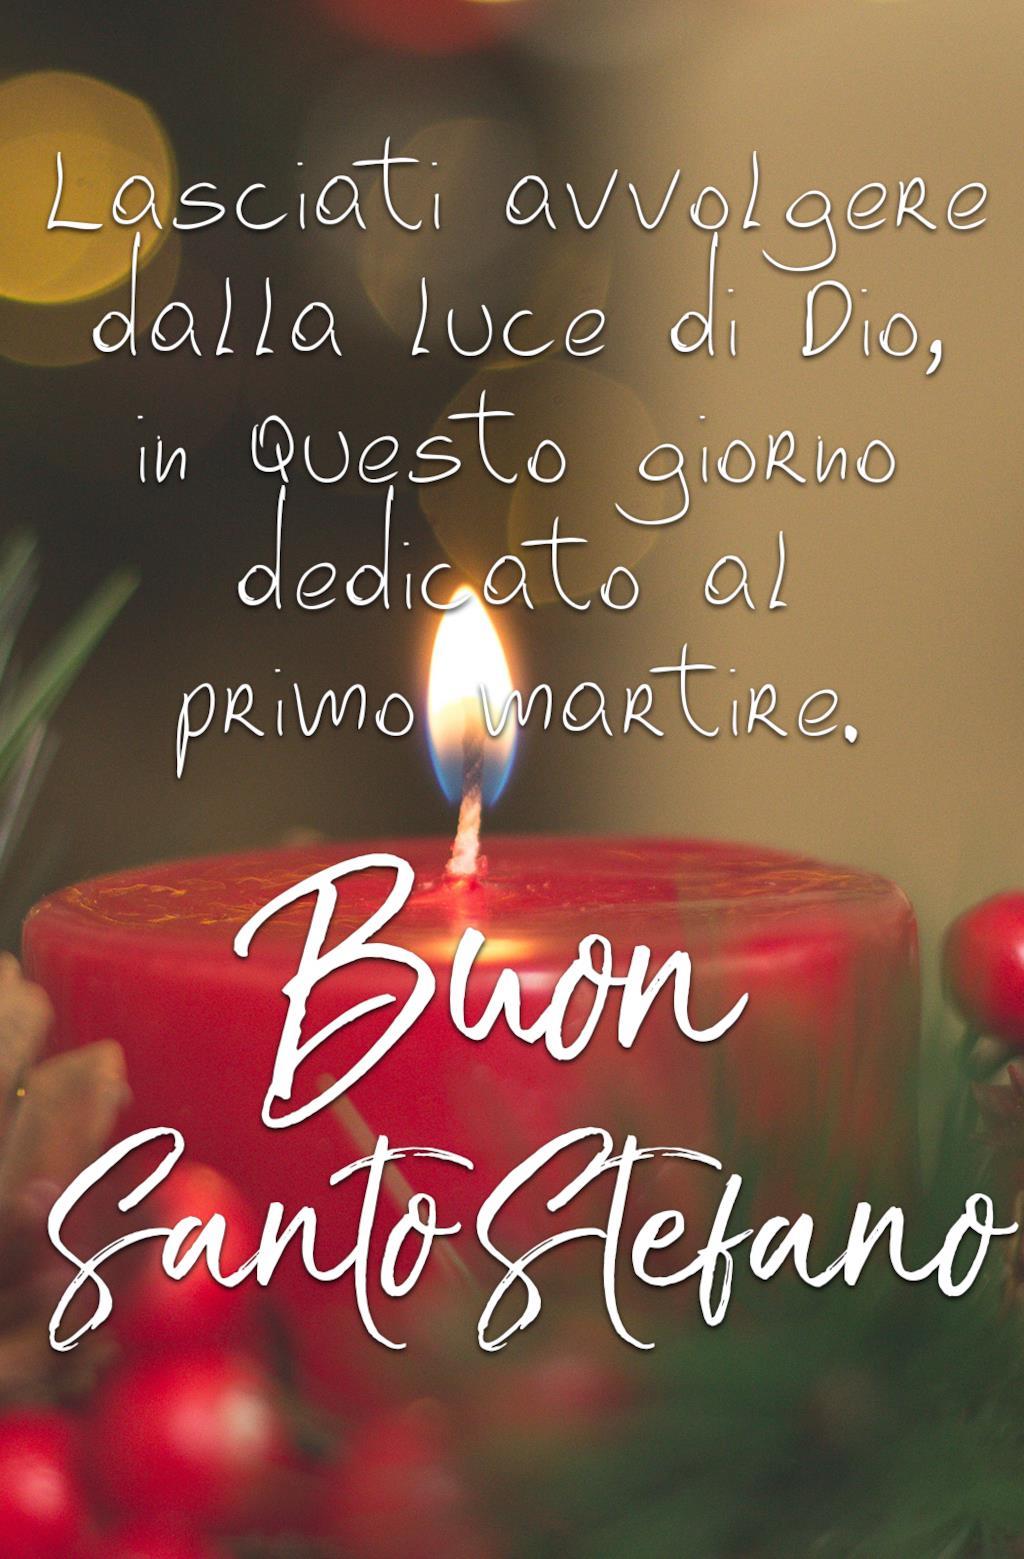 Buon Santo Stefano auguri religiosi